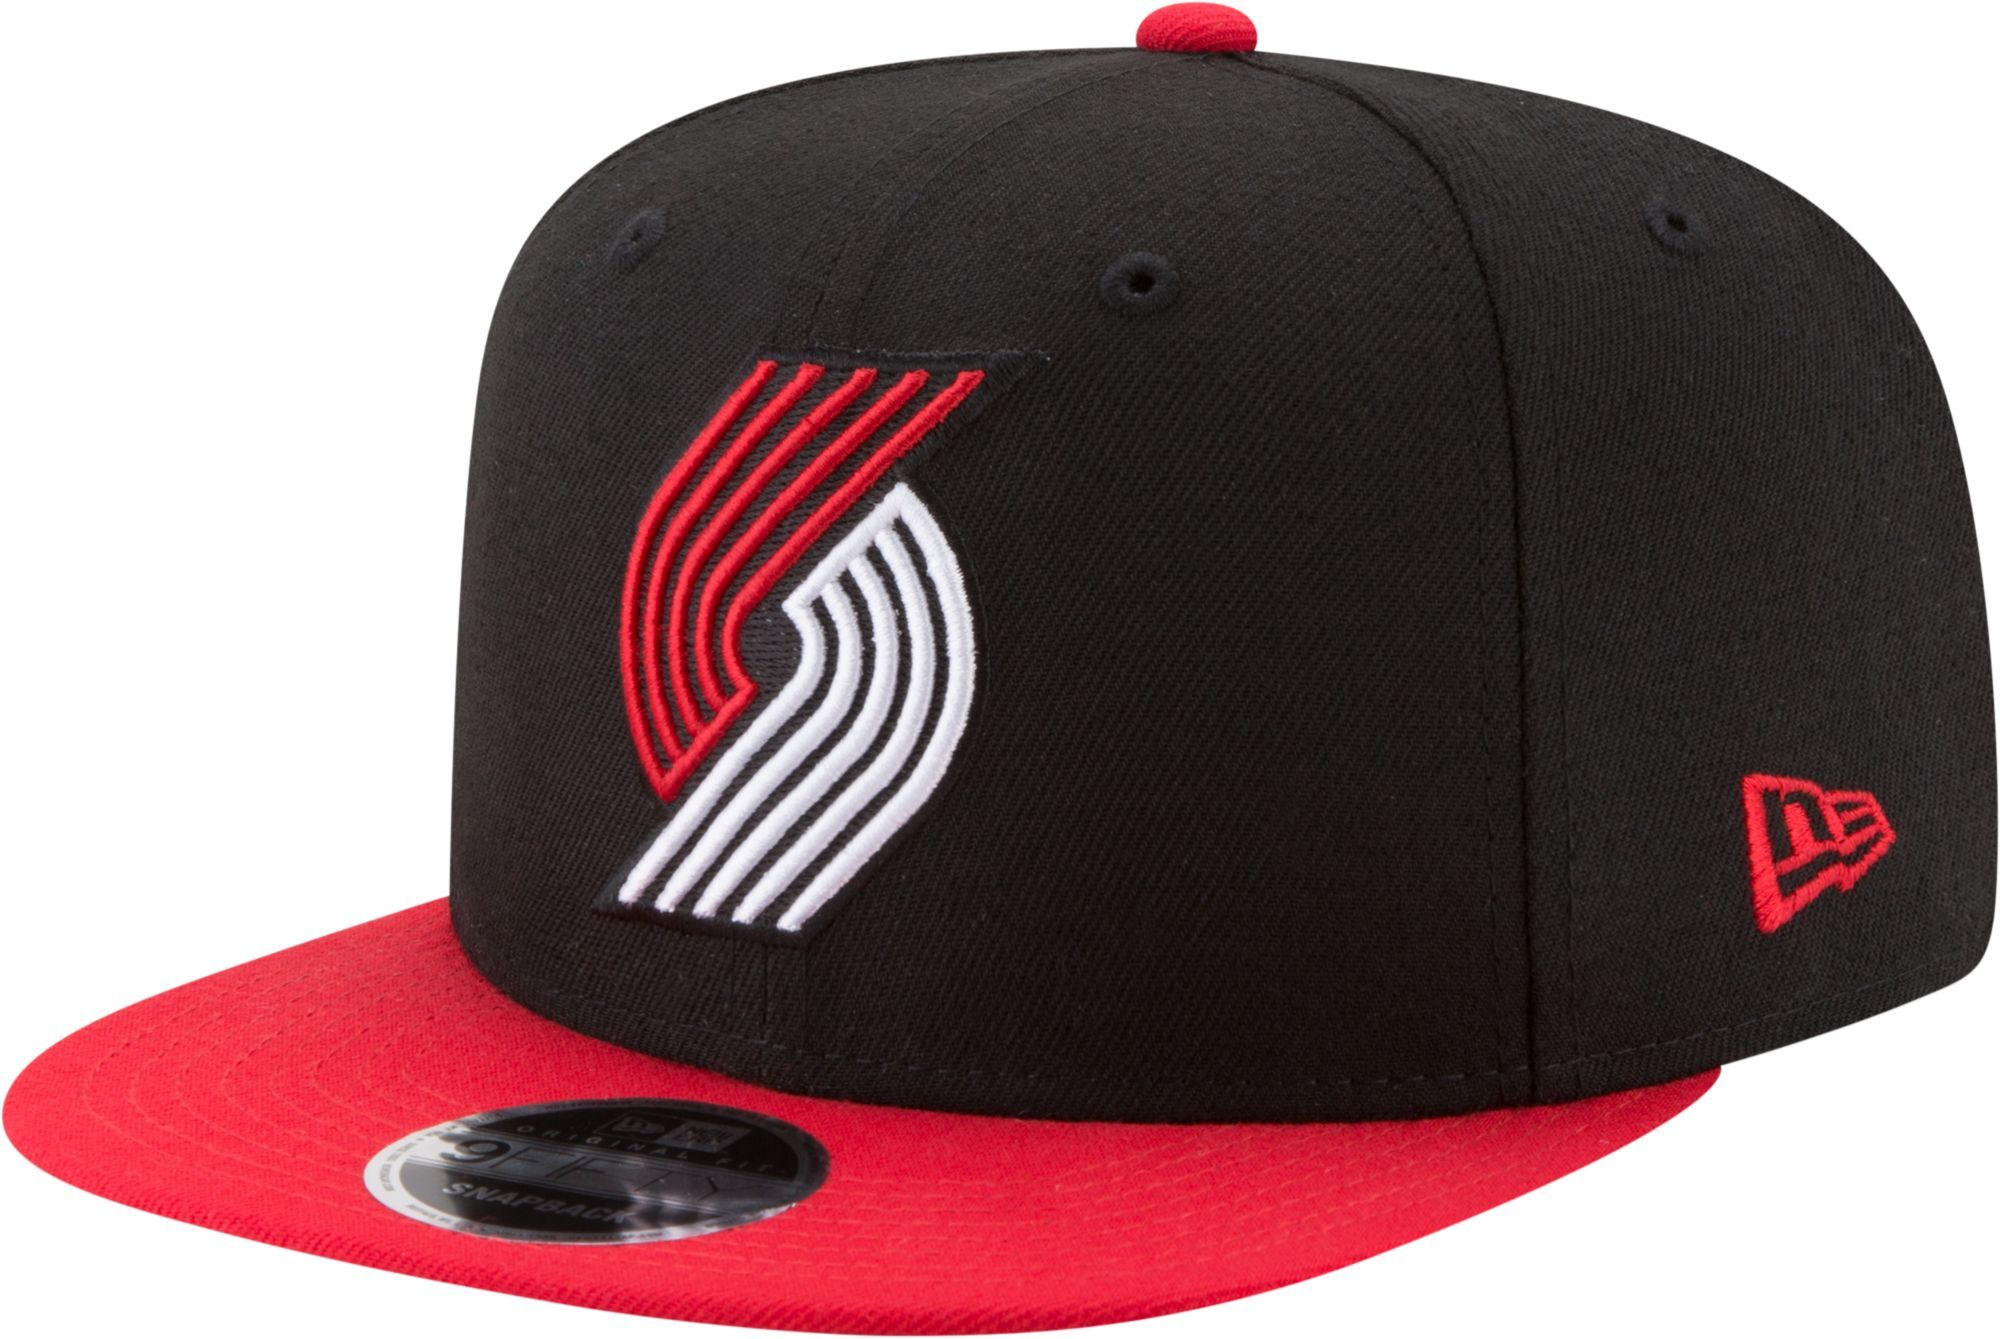 new arrival 5d2d2 f01d3 New Era Men s Portland Trail Blazers 9Fifty Adjustable Snapback Hat